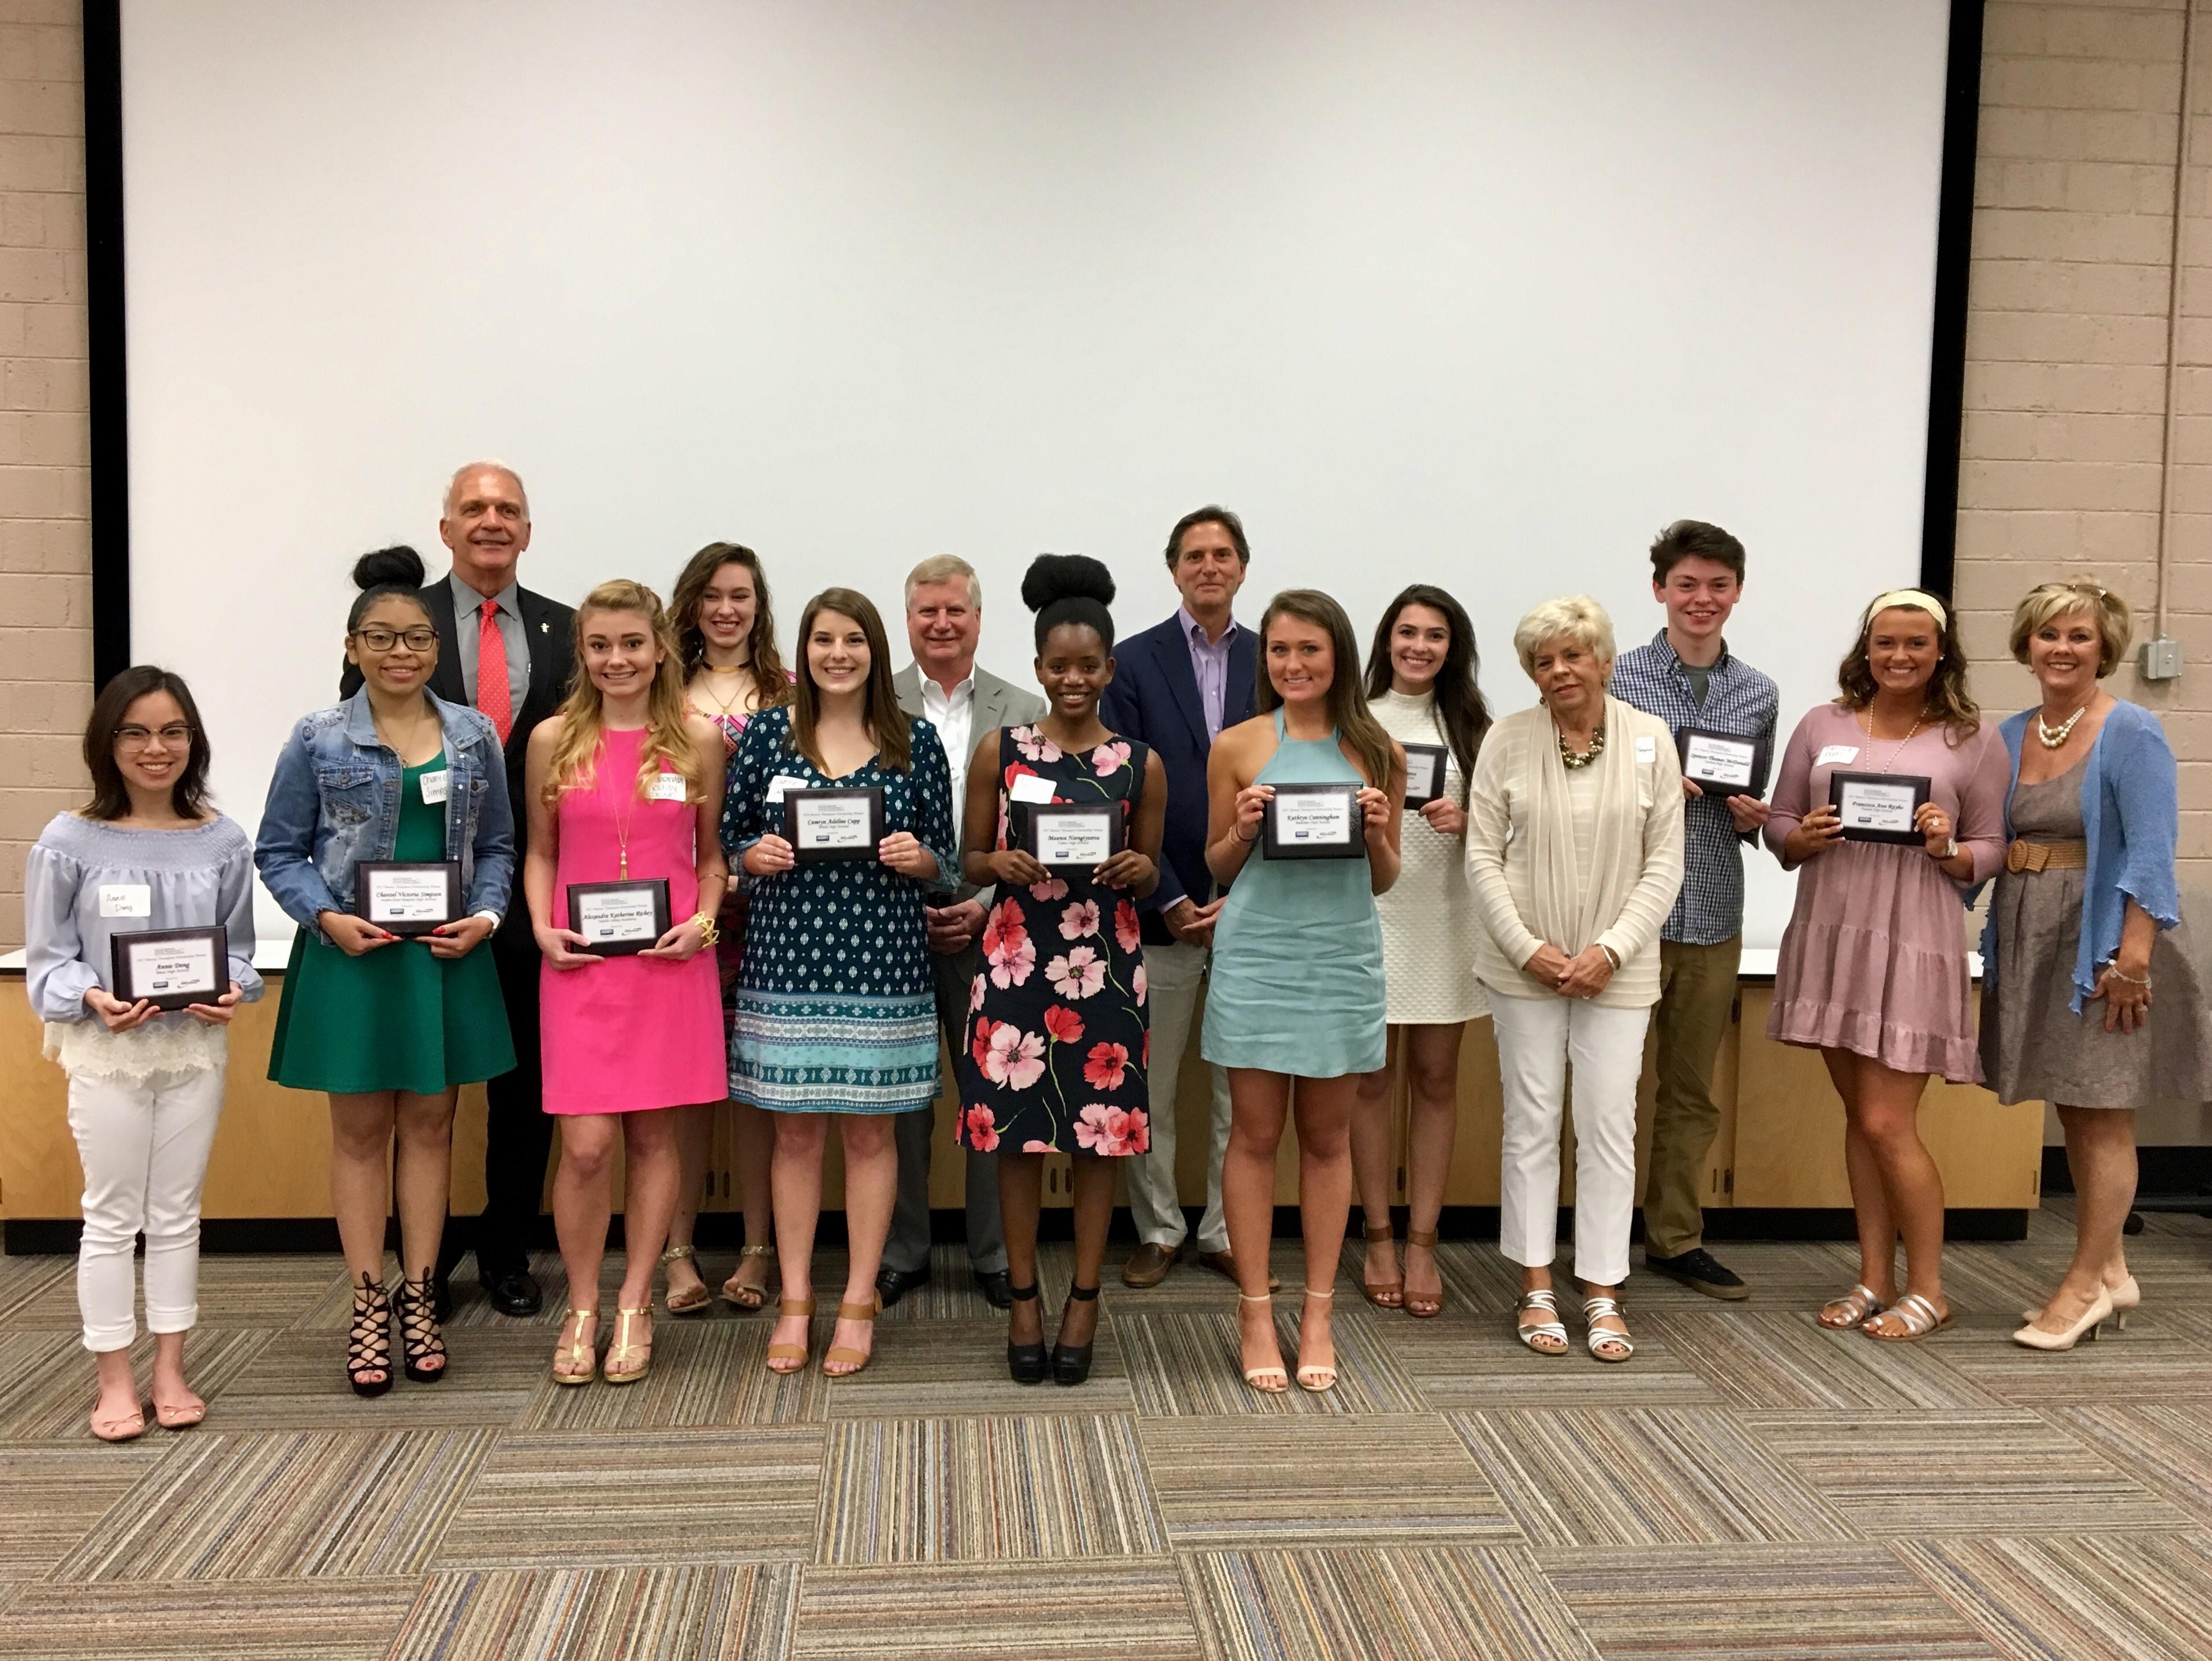 2017 Barney Thompson Scholarship Winners Announced